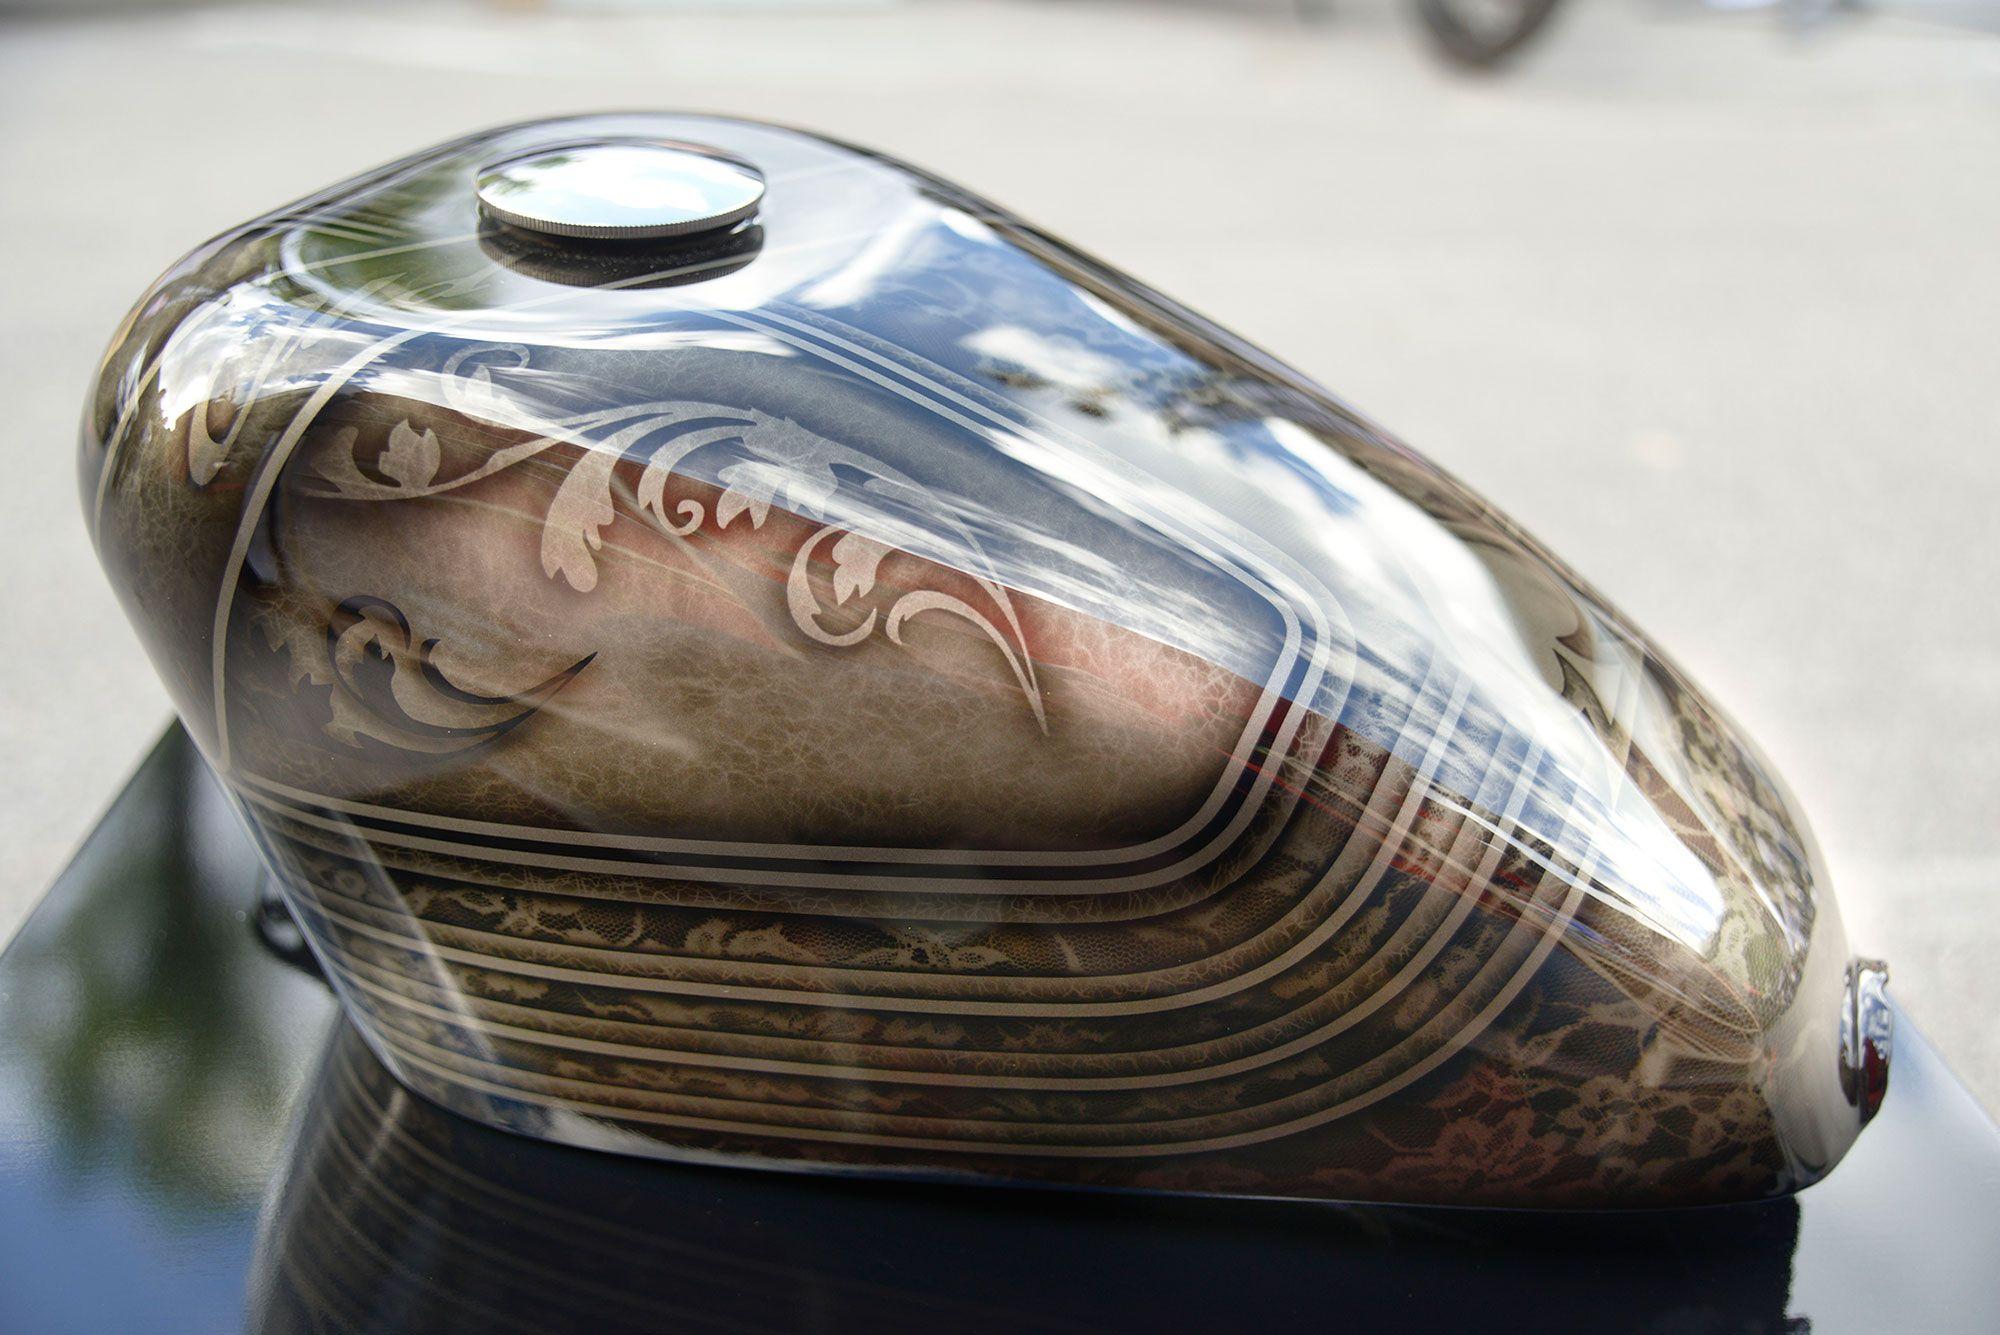 Harley Davidson Et Customs Oeuvre D Art Reservoir